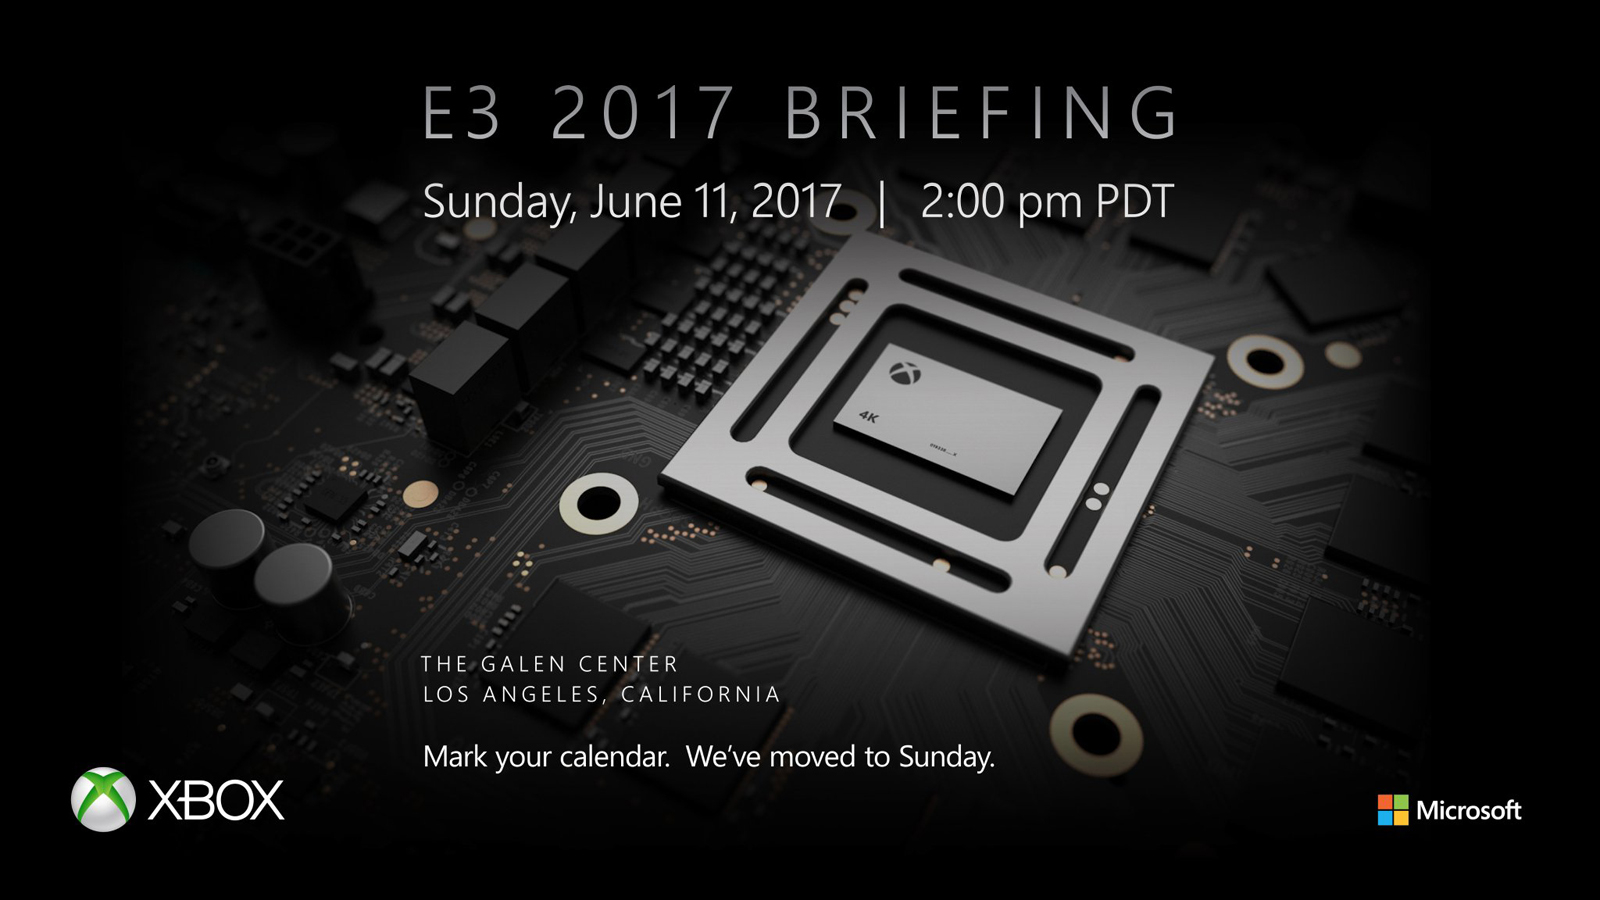 Microsoft привезет свою новейшую консоль Project Scorpio наE3 2017